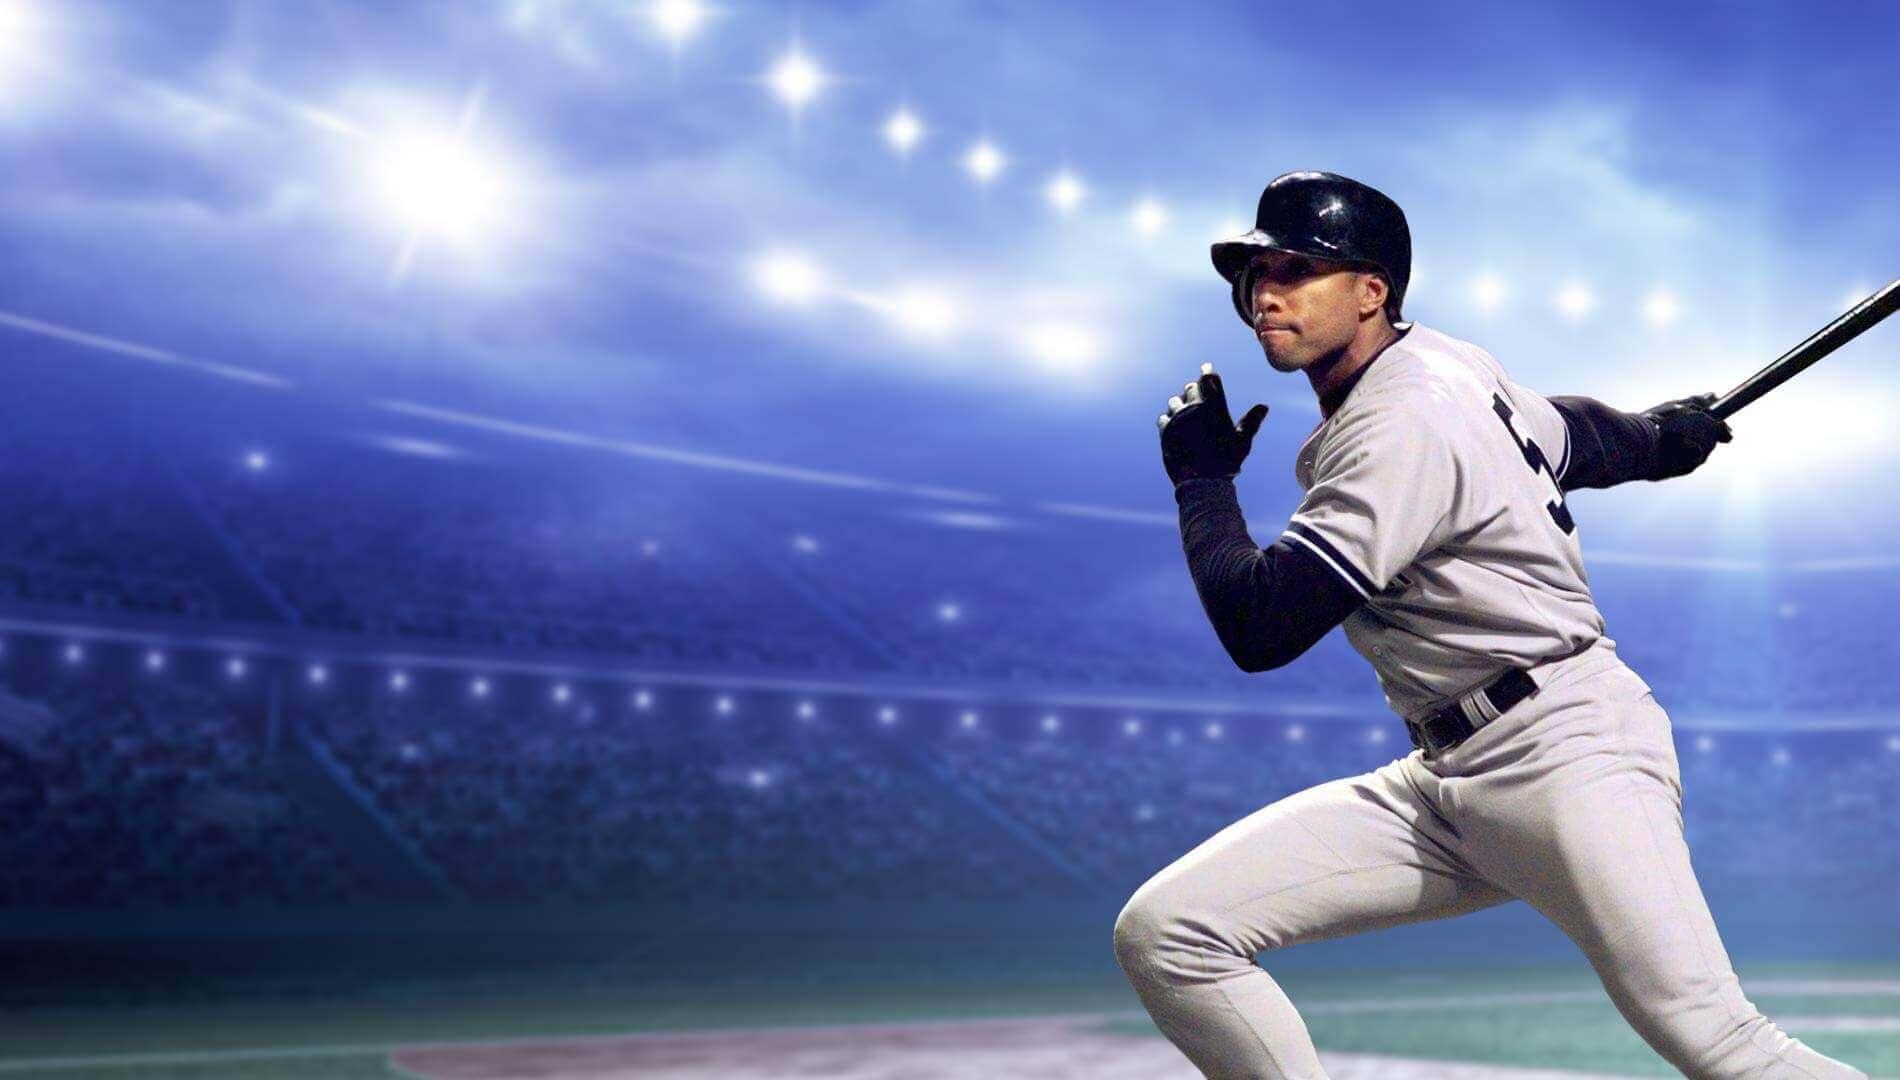 Bernie Williams Swinging a Bat in a Yankees Uniform